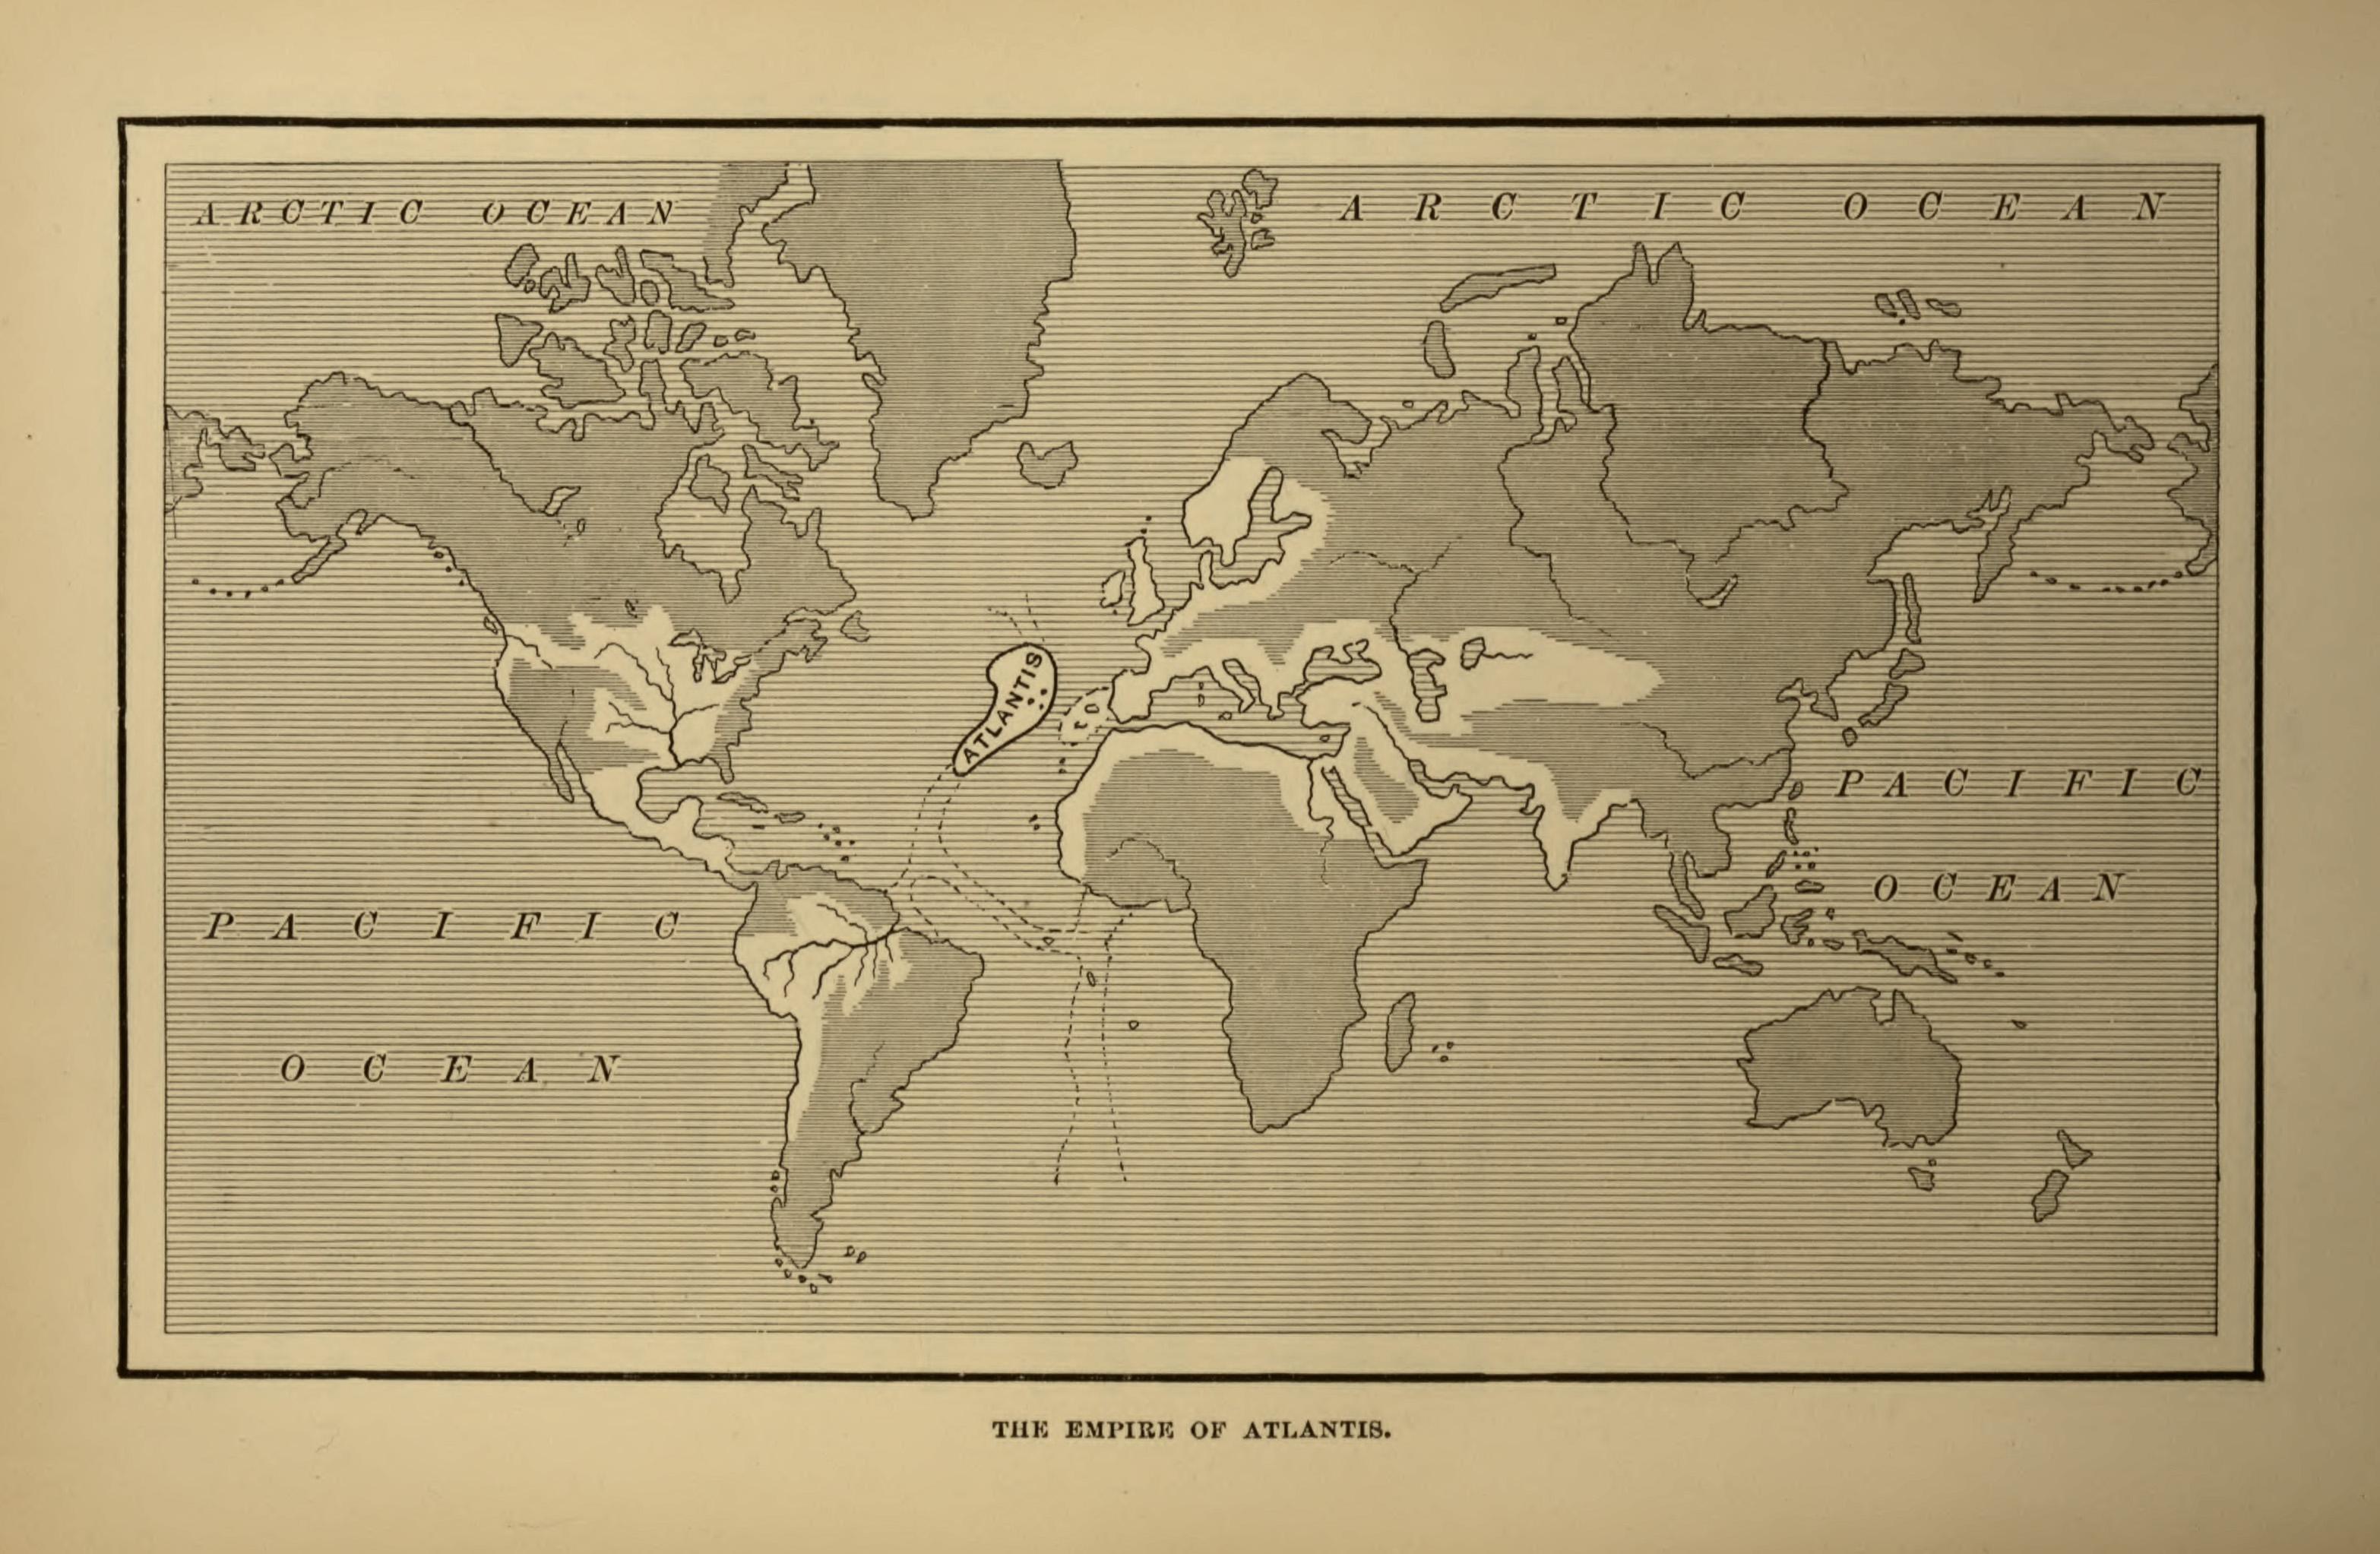 File:Atlantis map 1882.jpg